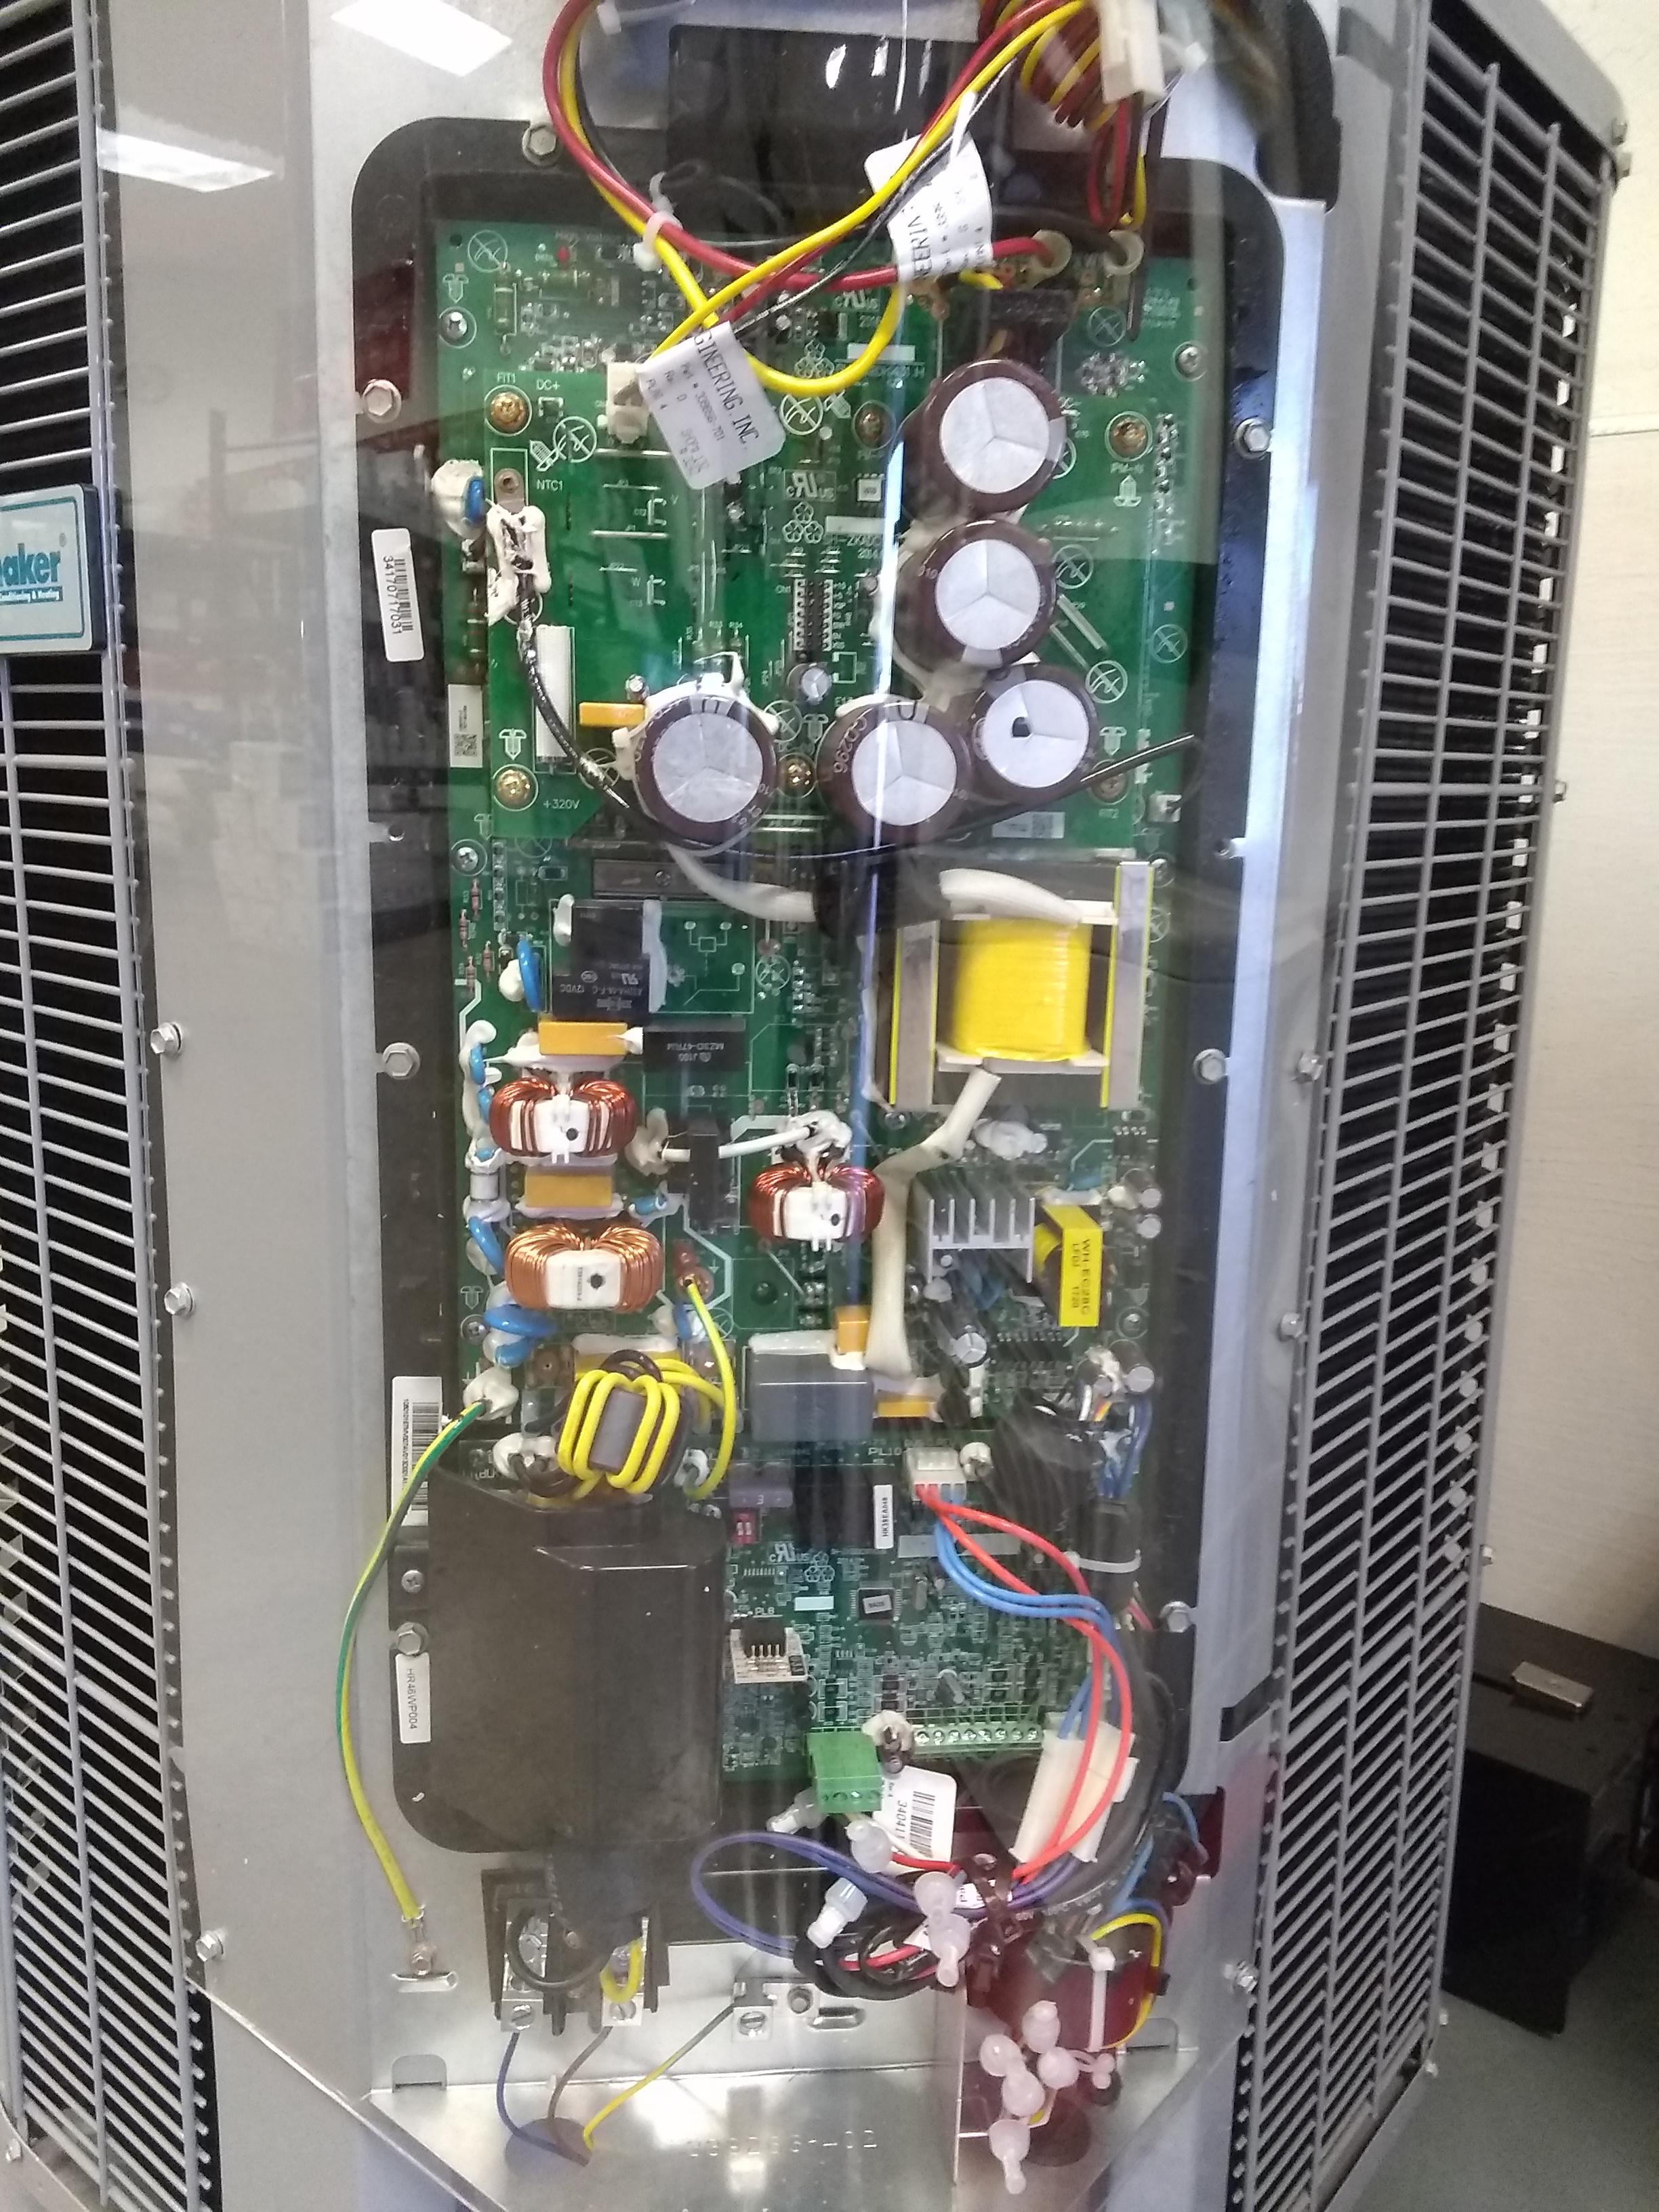 inverter circuit board inside high efficiency ICP heat pump unit